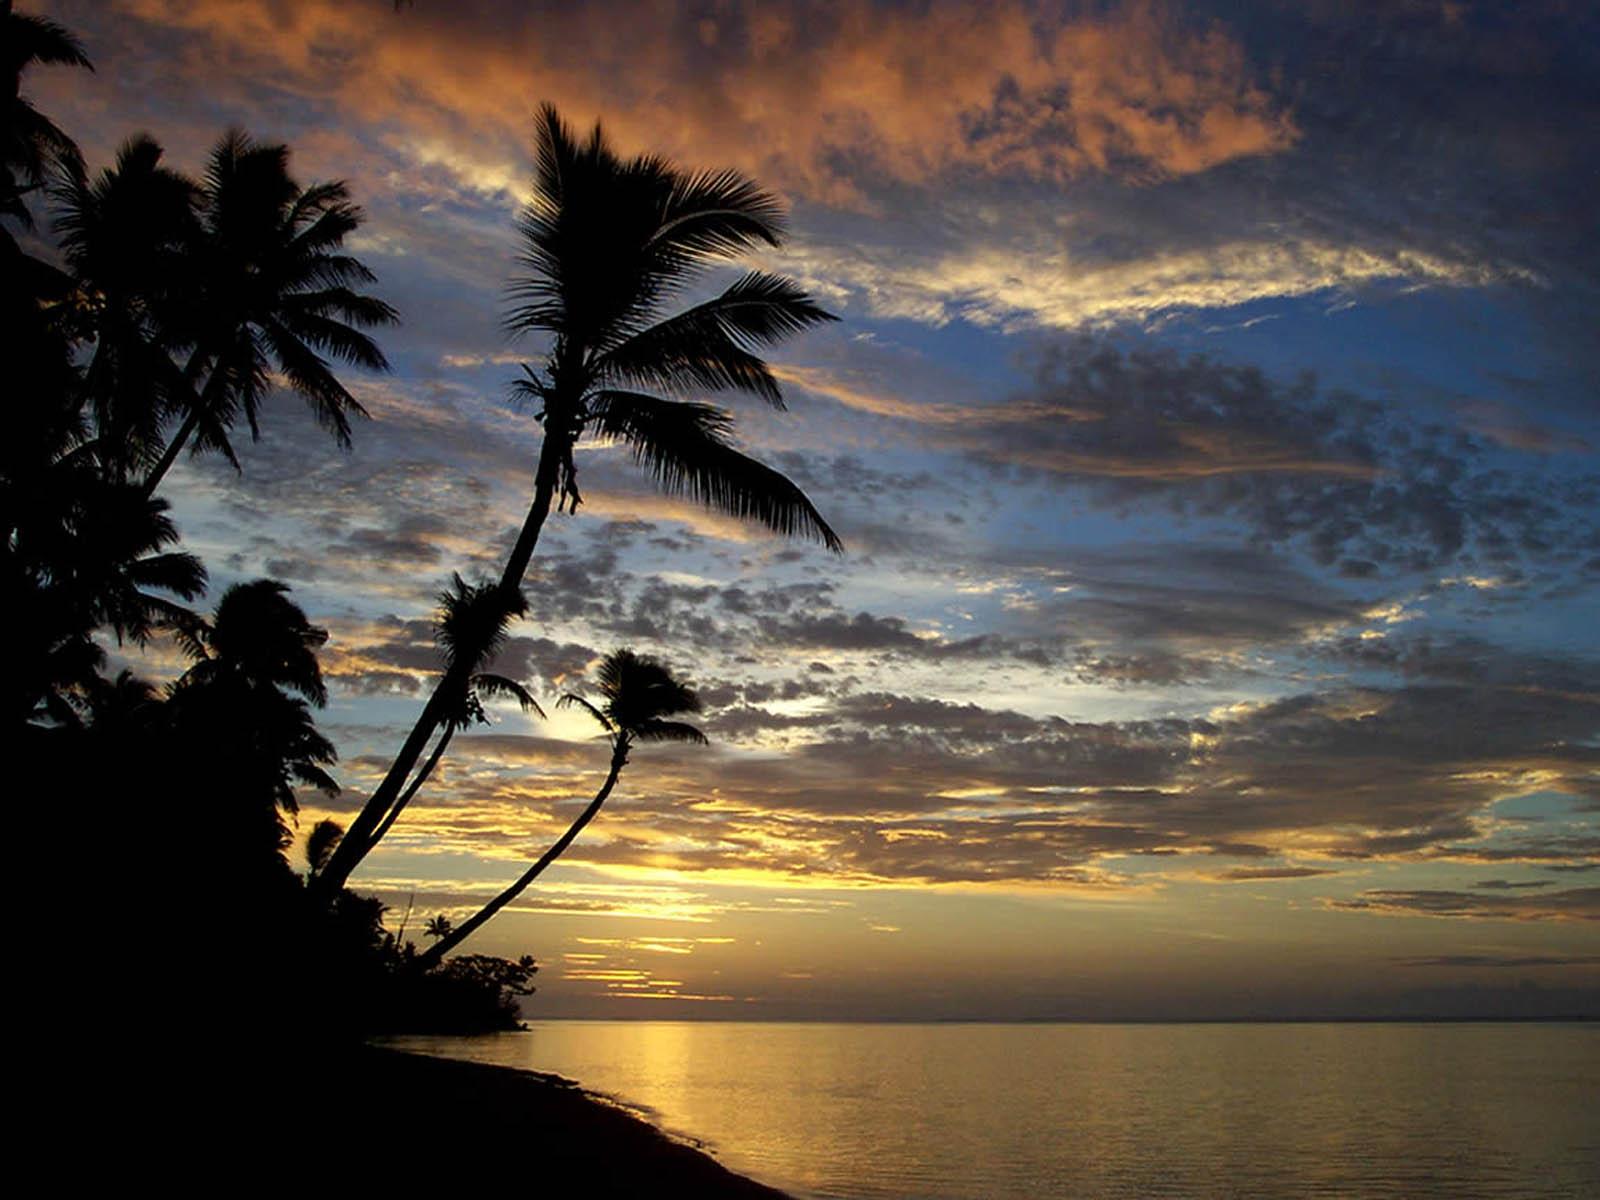 sunset wallpapers for desktop - photo #14